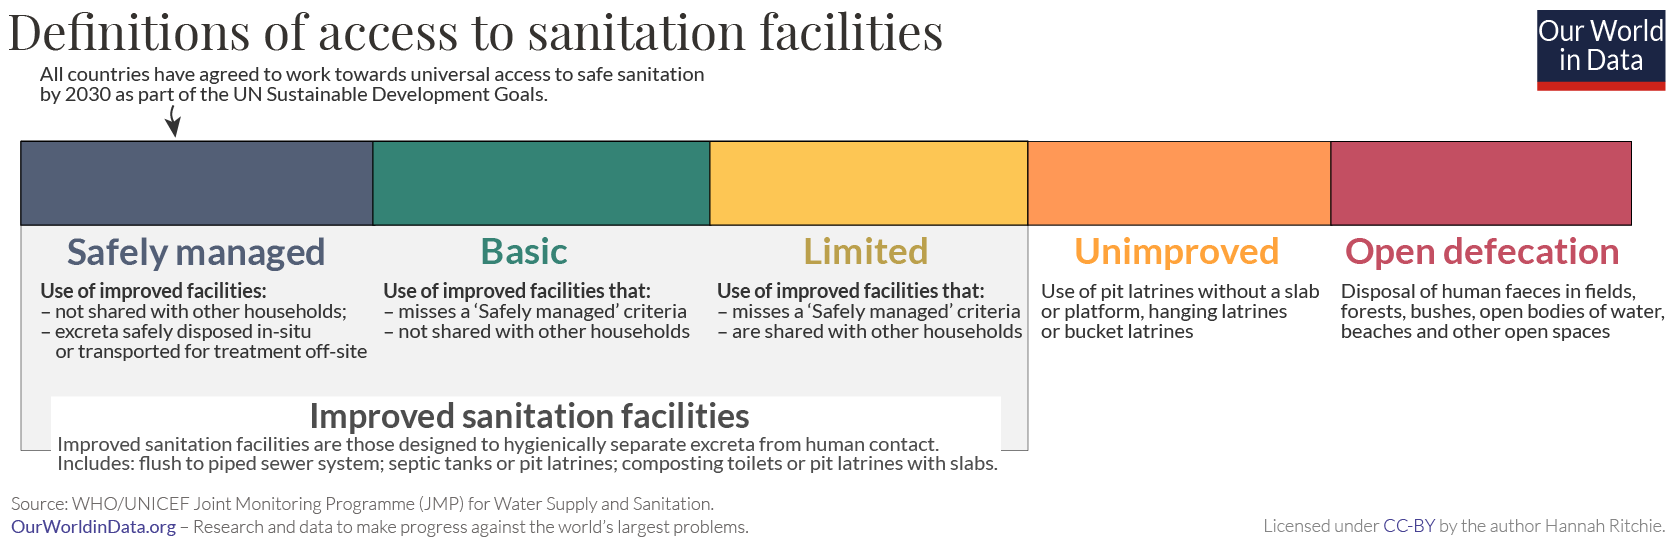 Sanitation definitions